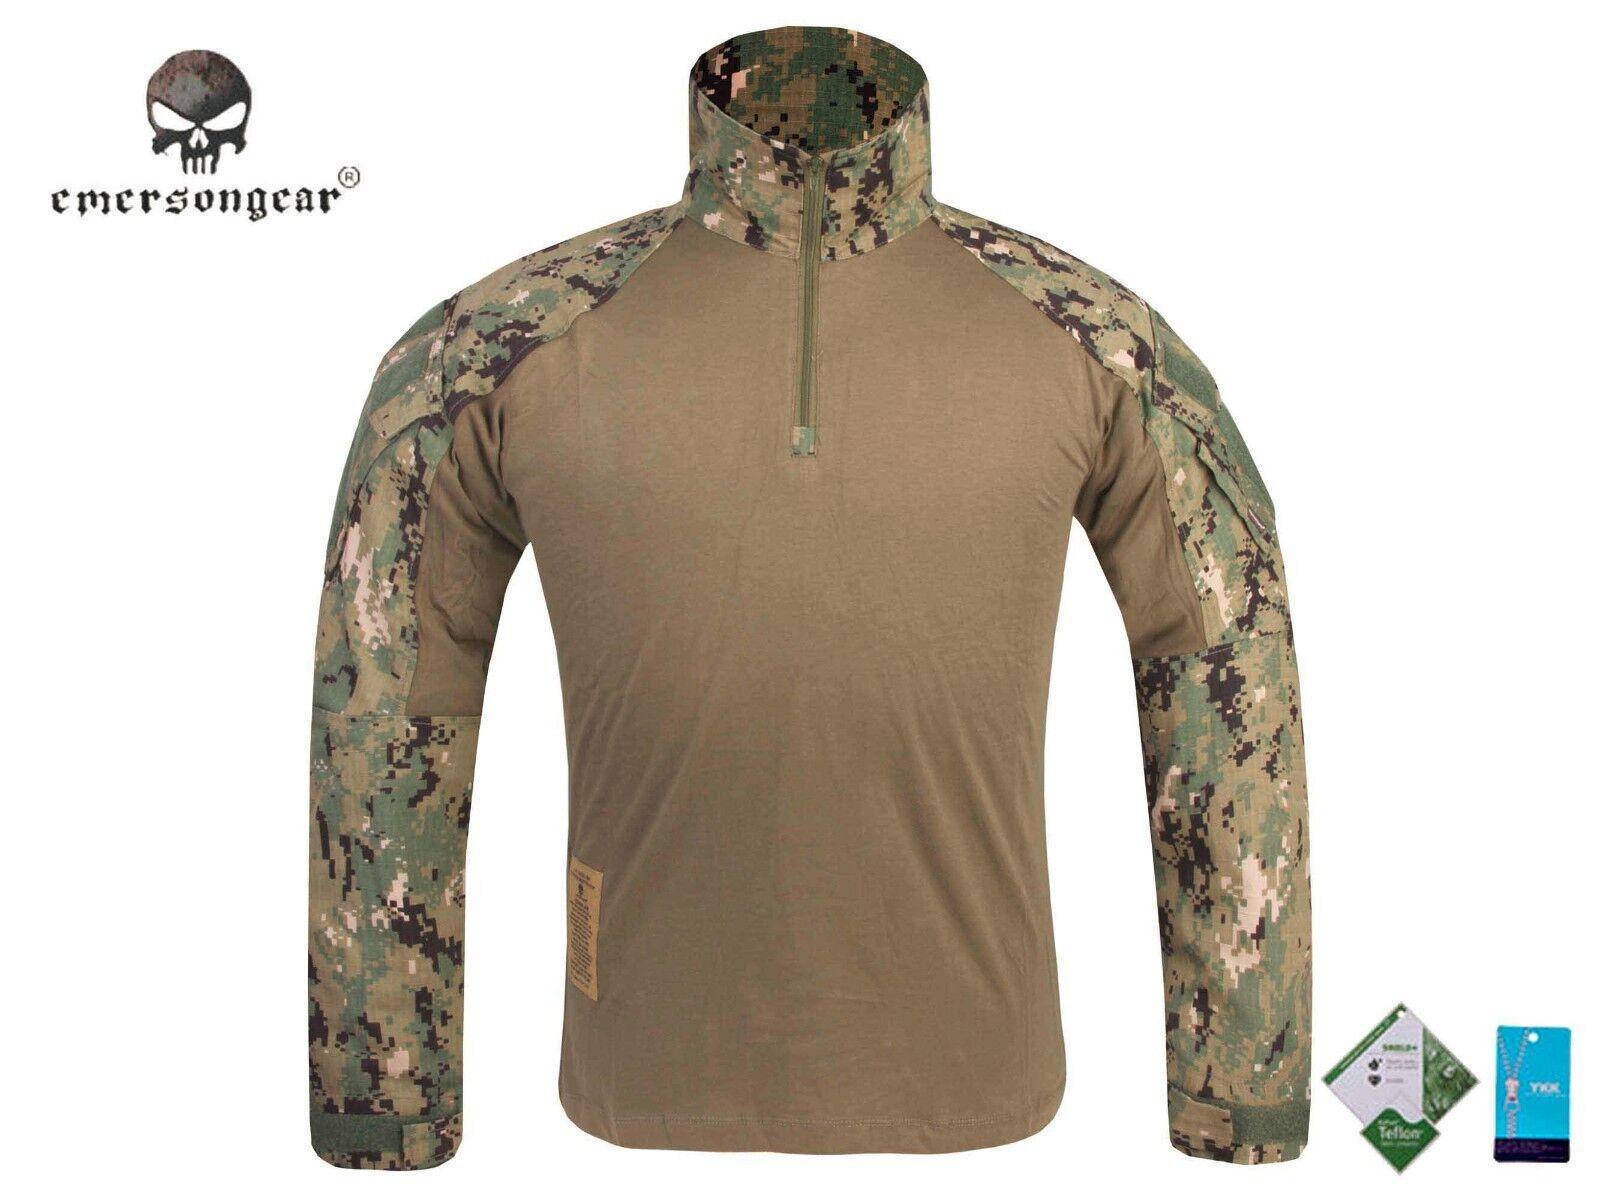 Emerson Combat Gen3 Shirt Airsoft Hunting Military Tactical bdu Shirt Aor2